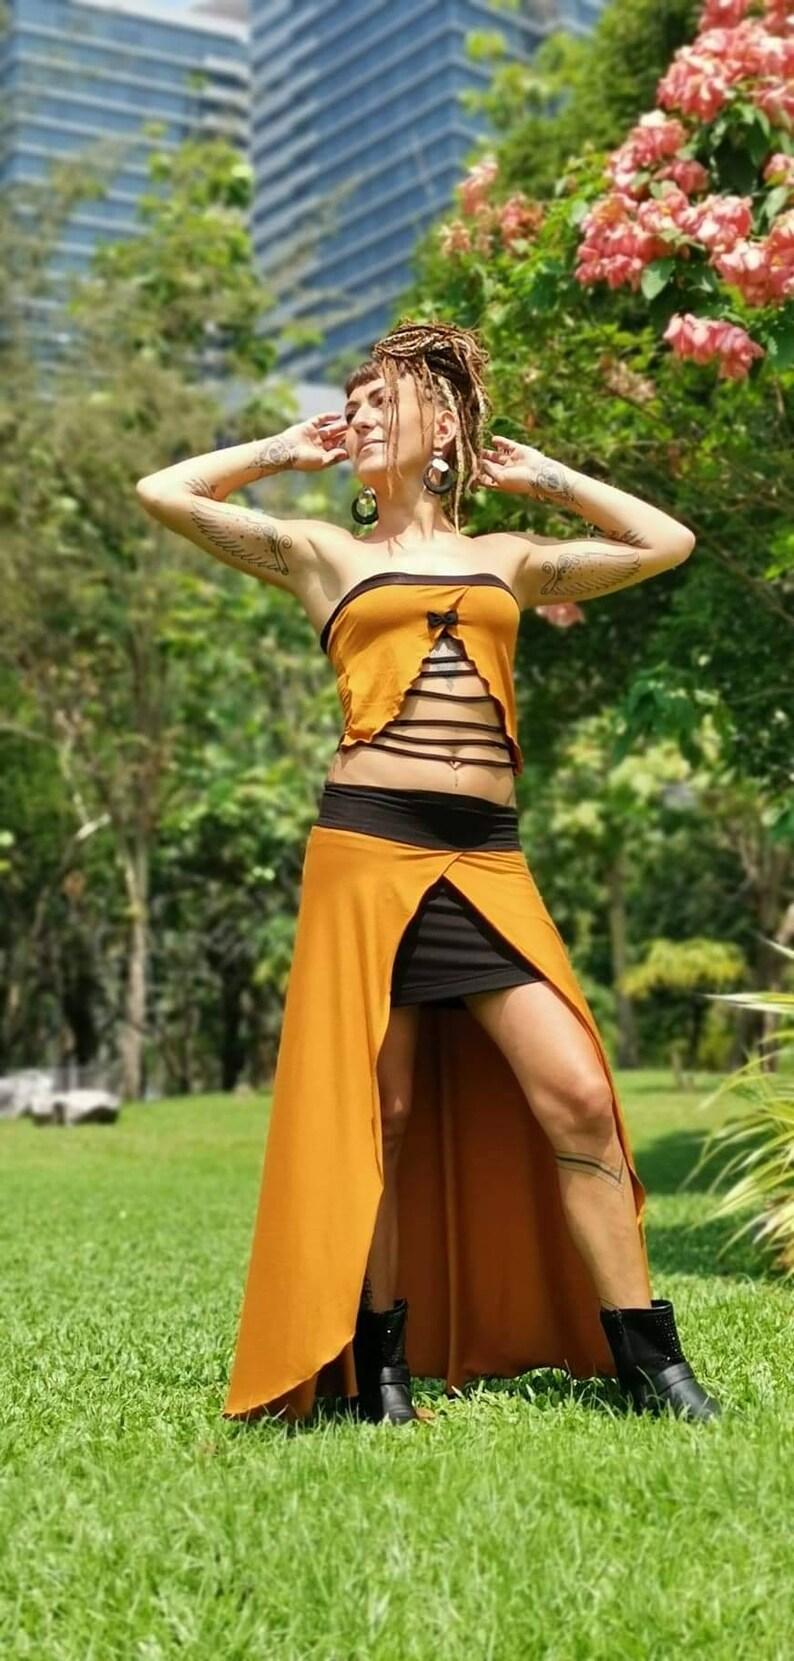 Boho Skirt Boho Dress Witch Dress Boho Top Alternative Fashion Comfortable Boho Ensemble Festival Clothing Pixie Clothing